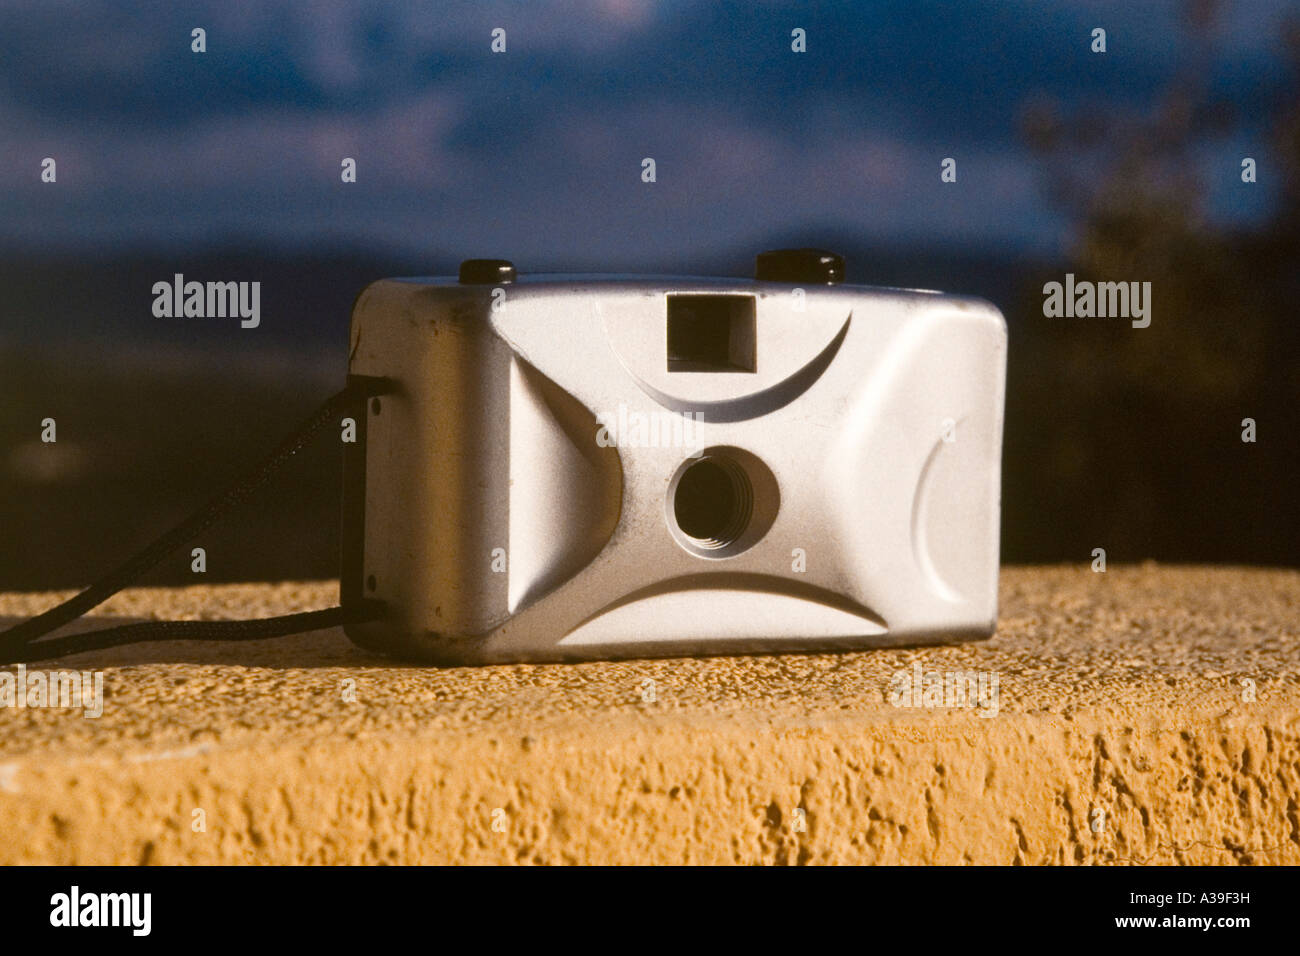 photography, photo, image, economy, silver, shadow, plastic, analog, lightweight, top, wall, gray, black, rectangular, - Stock Image